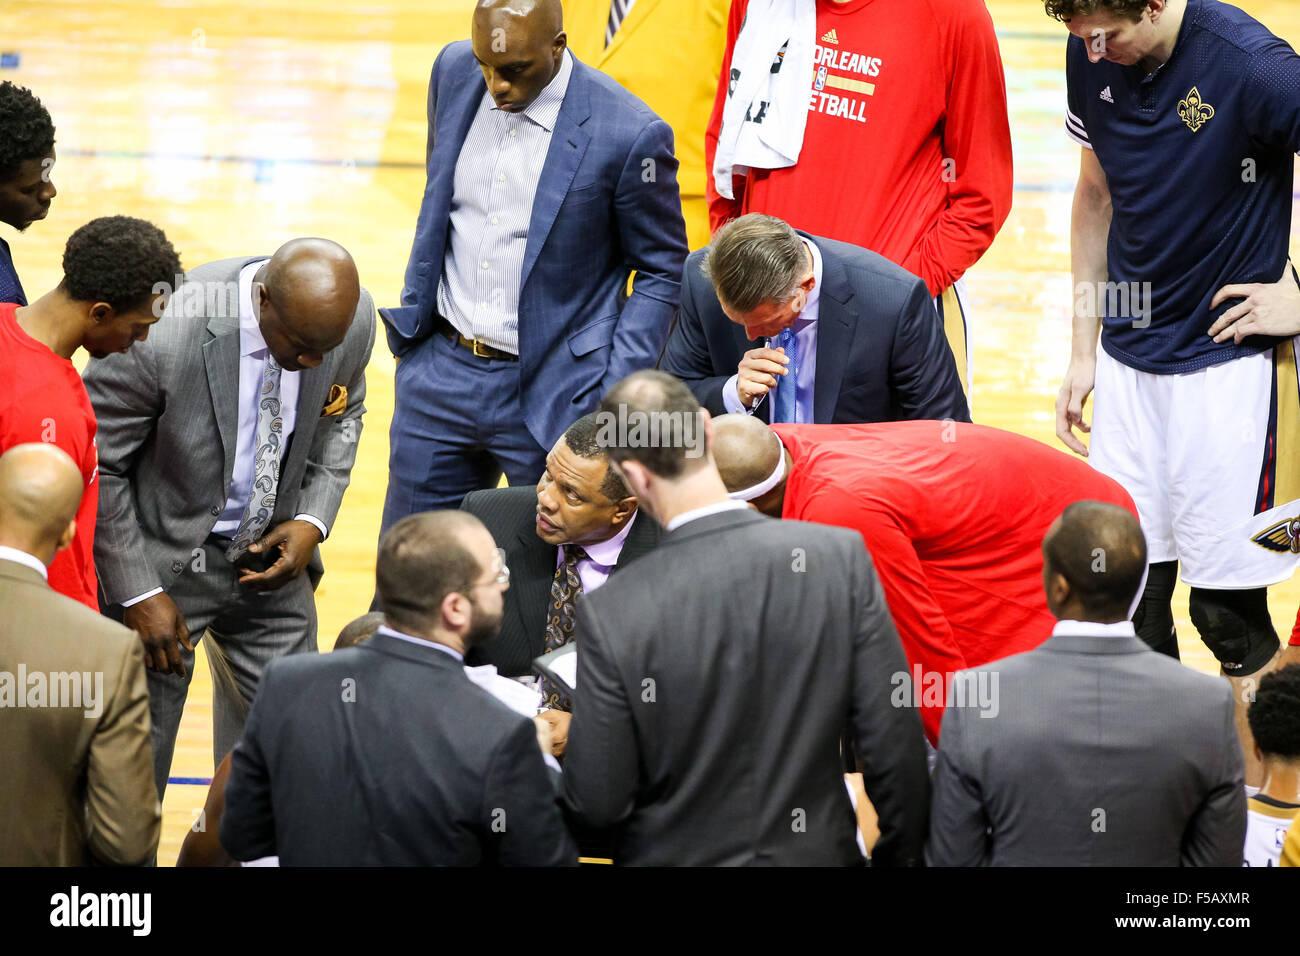 New Orleans La Usa 31st Oct 2015 New Orleans Pelicans